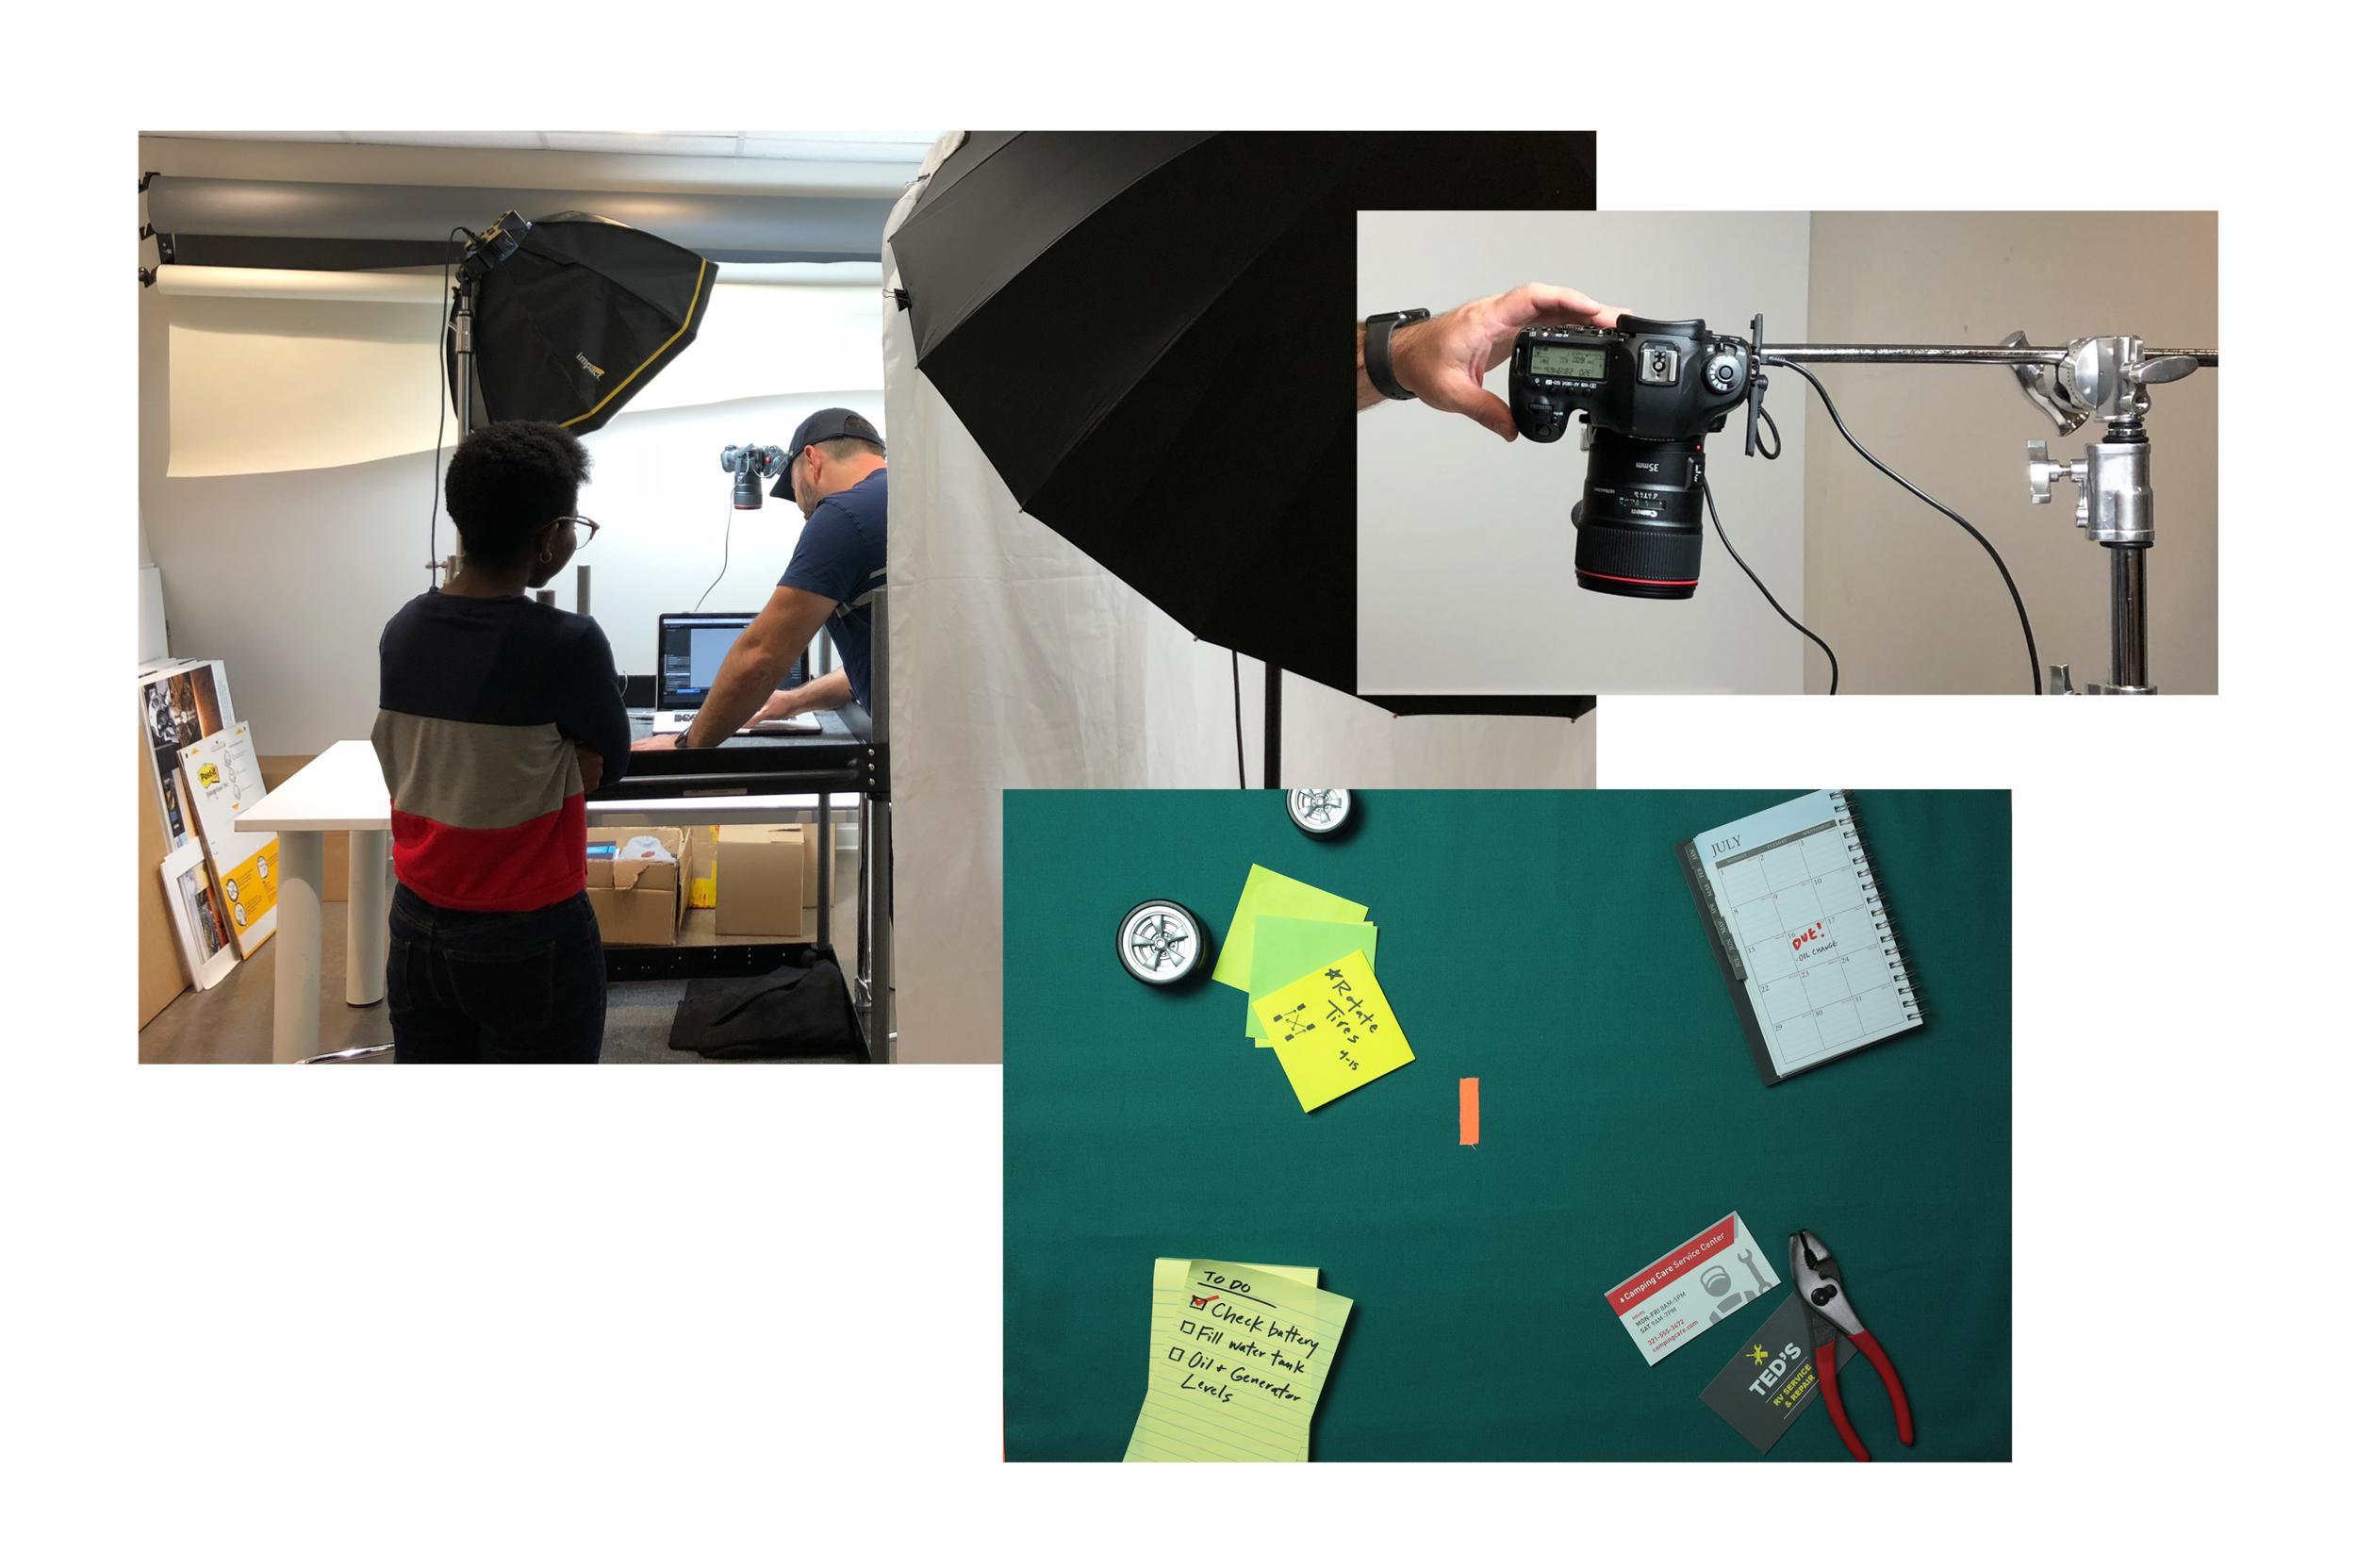 togo-stop-motion-facebook-ads-behind-scenes.png